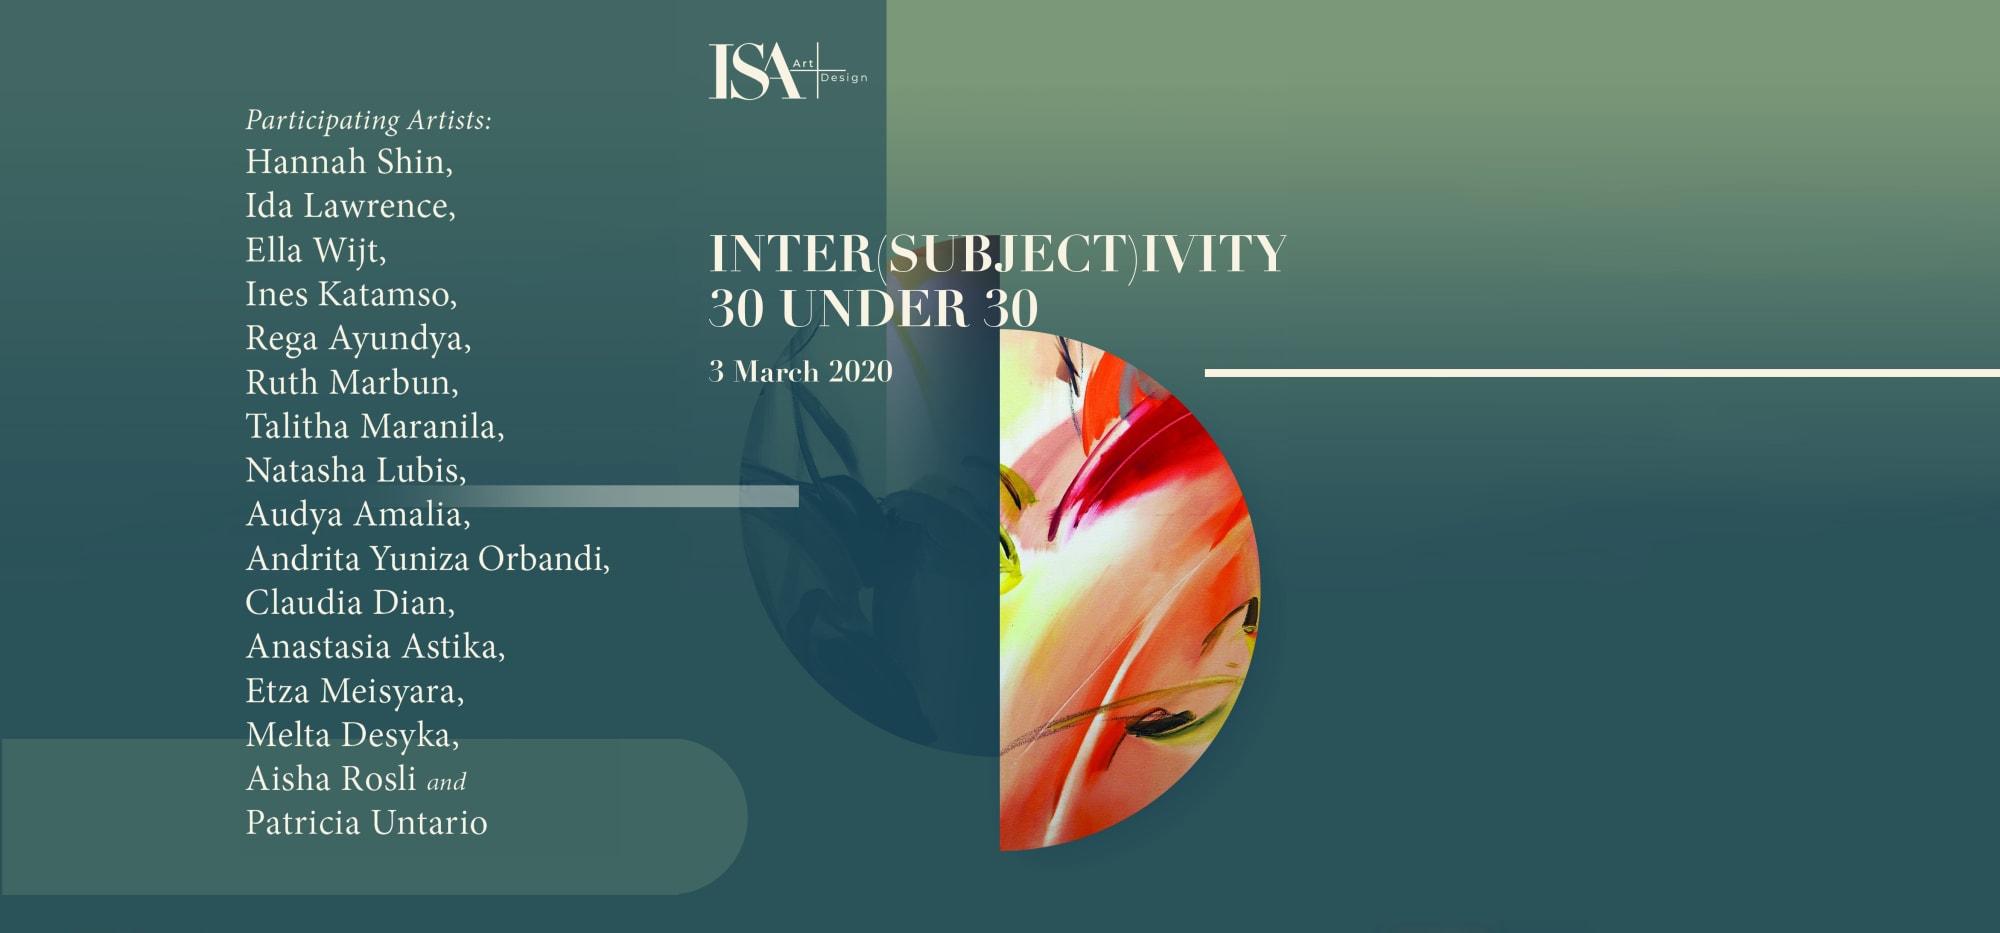 30 Under 30 : Inter( Subjecti)vity